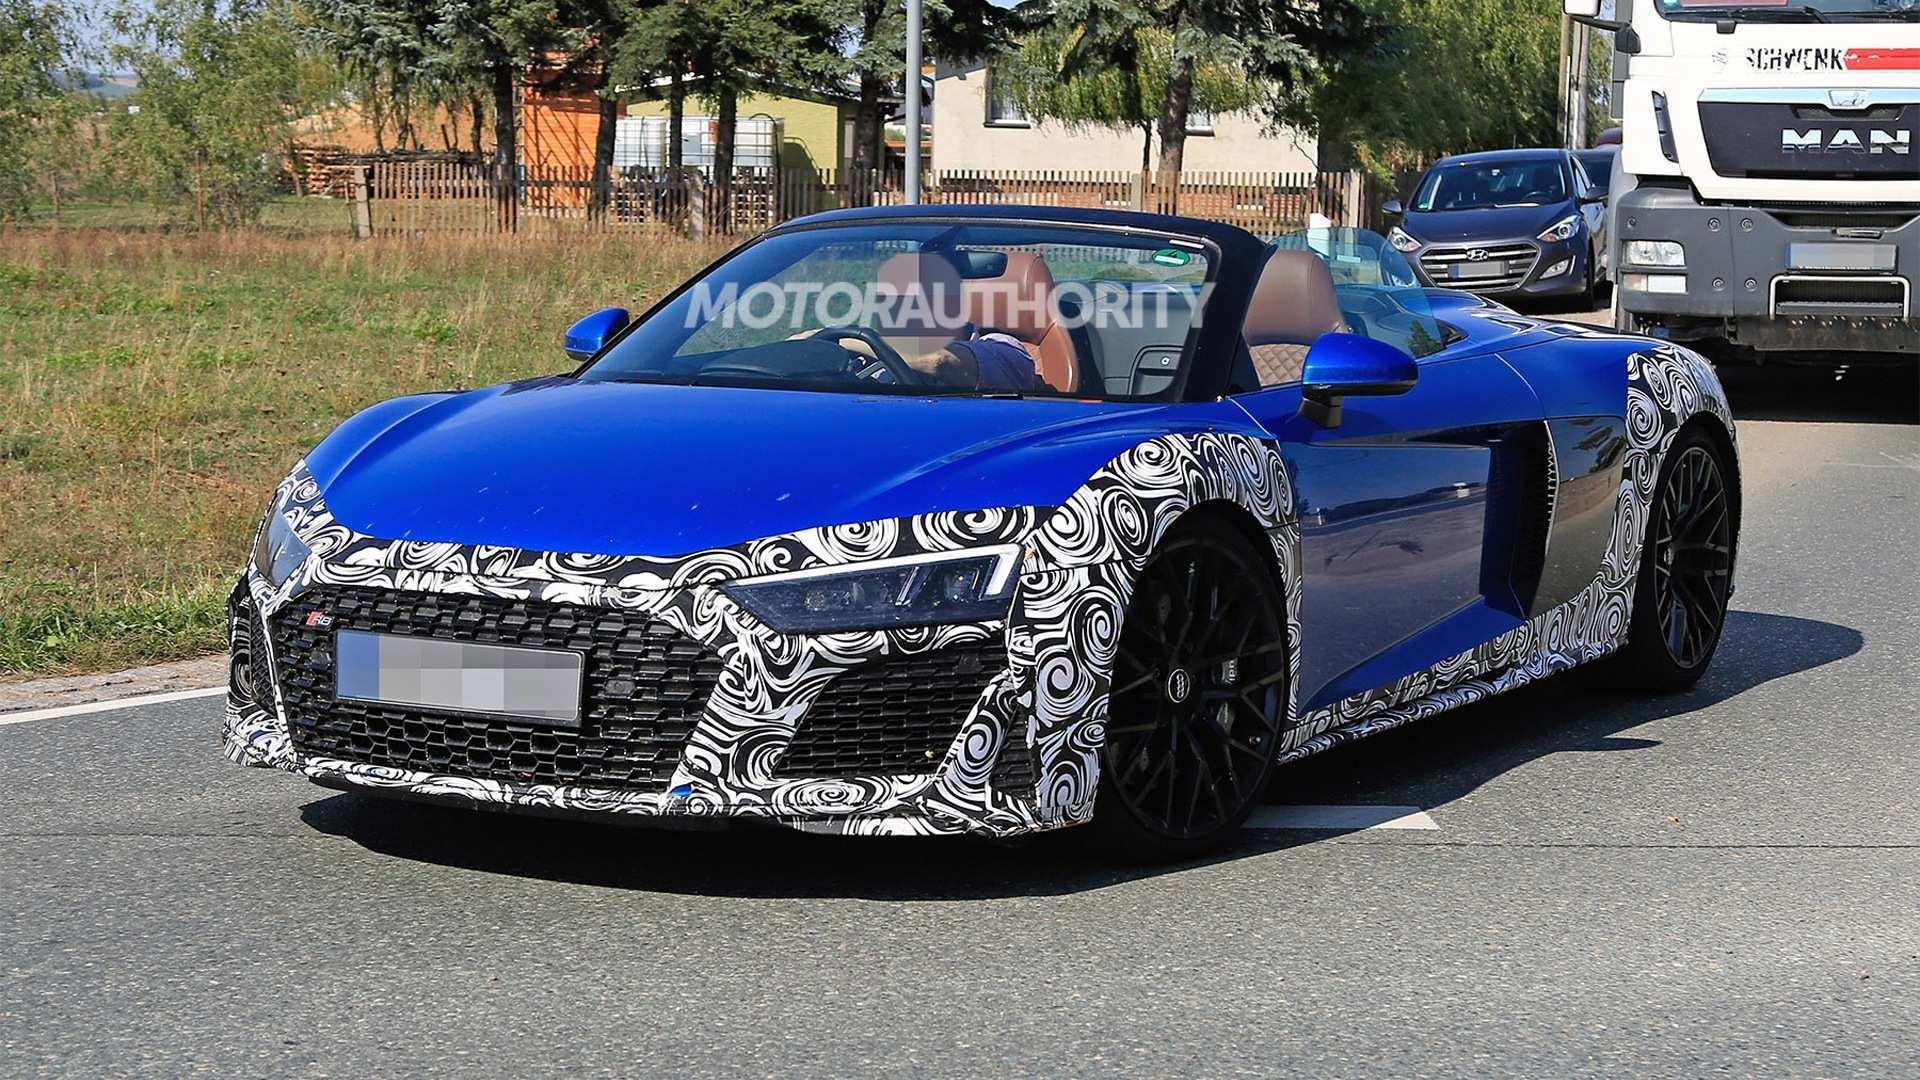 59 Concept of 2020 Audi R8 V10 Spyder Configurations by 2020 Audi R8 V10 Spyder